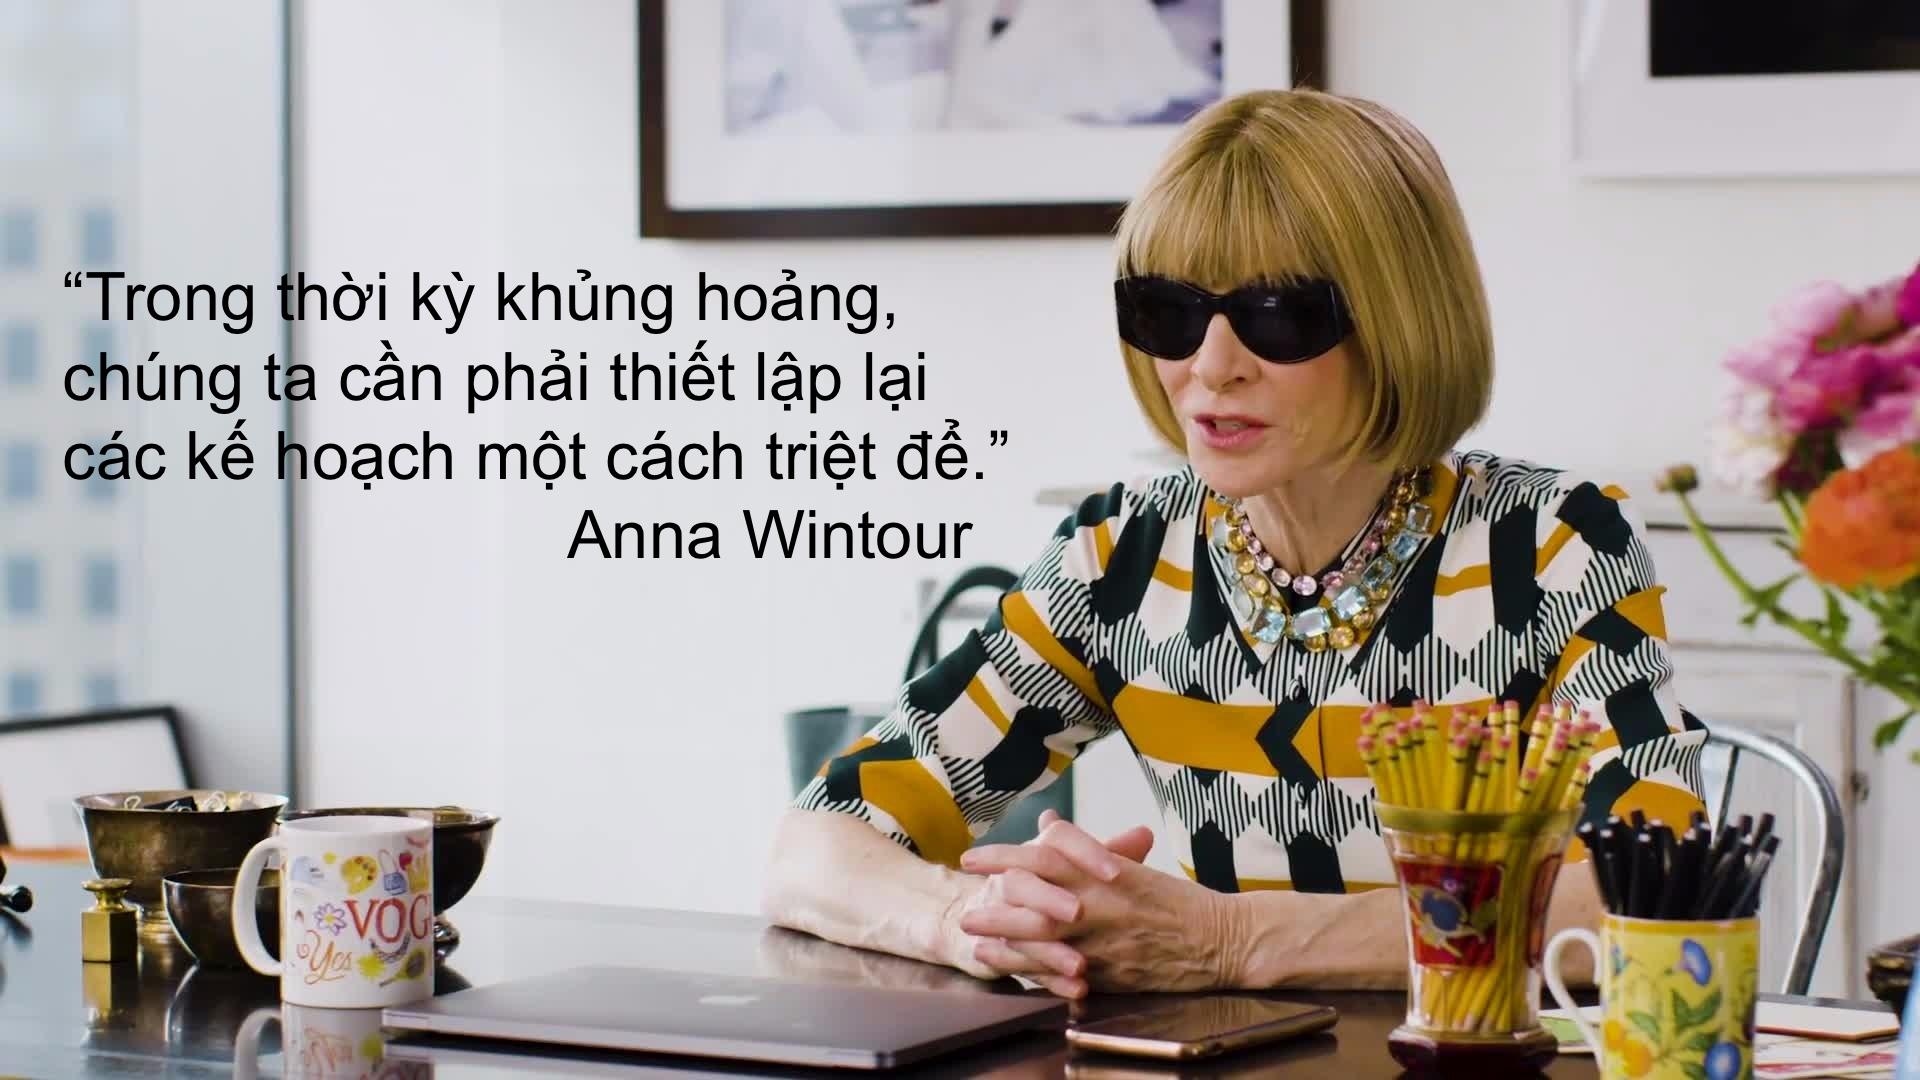 3_cong nghiep thoi trang_copy_elle man_0320